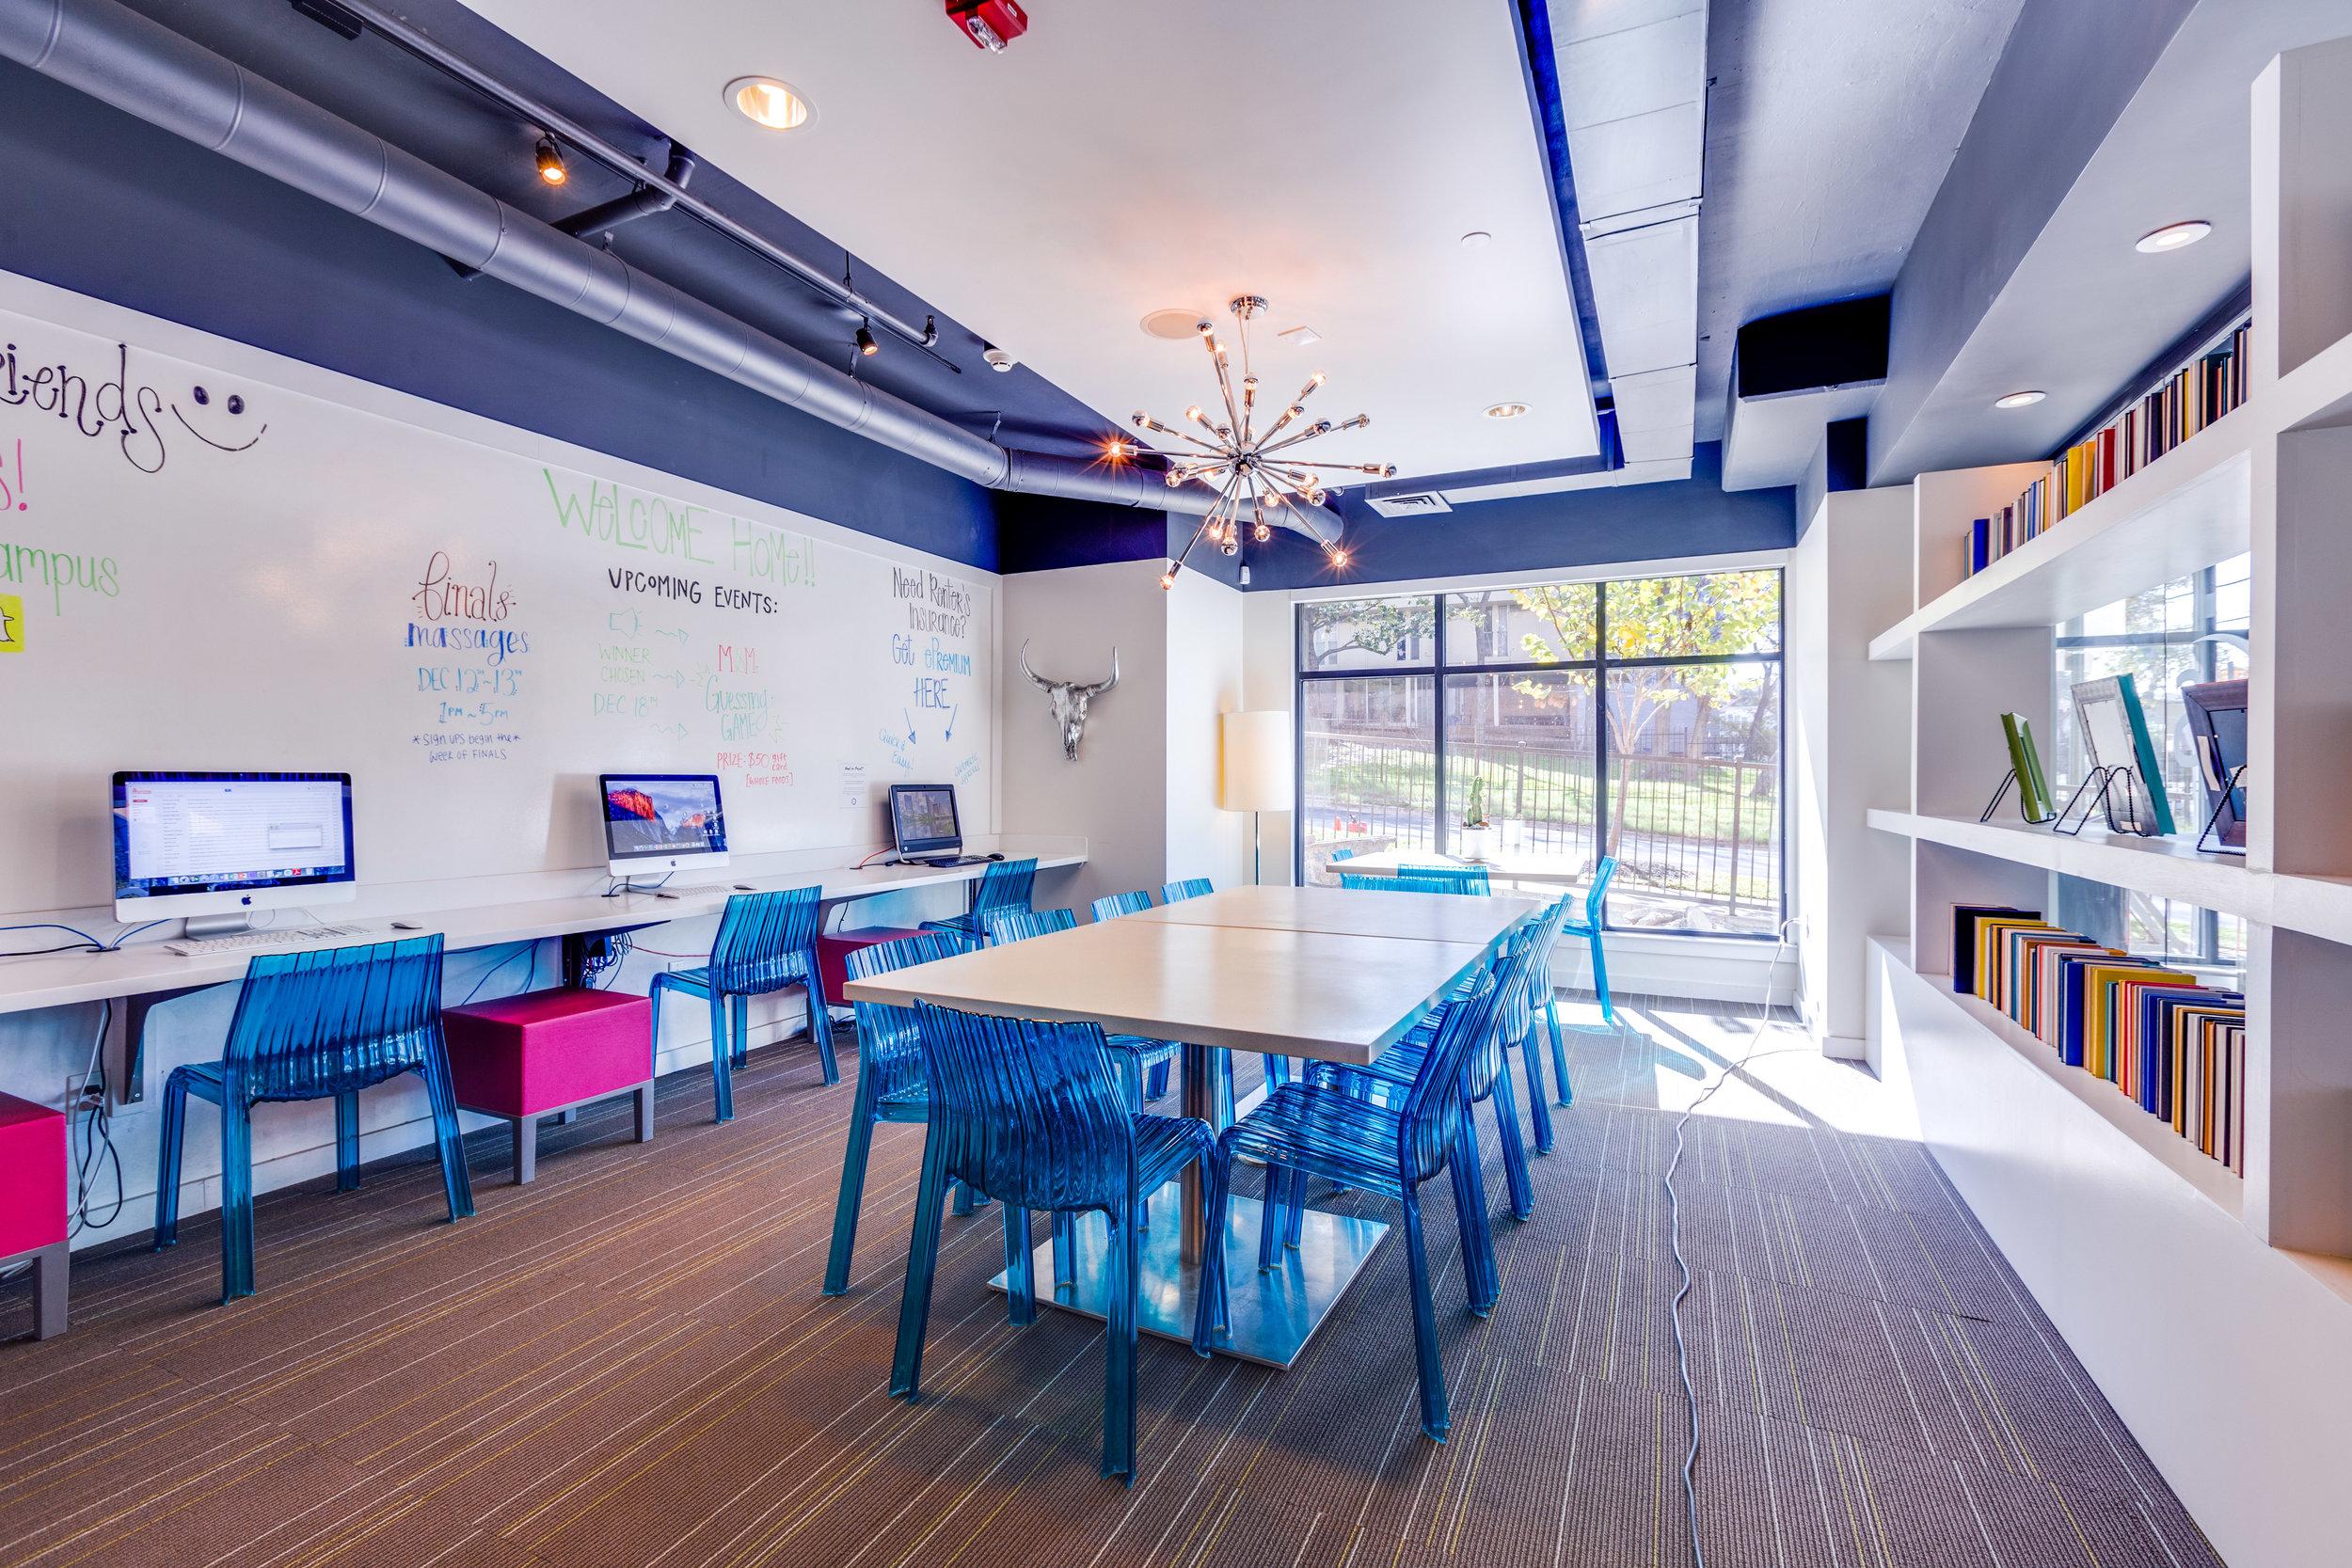 Axis West Campus - Austin, Texas (Multimedia Room)